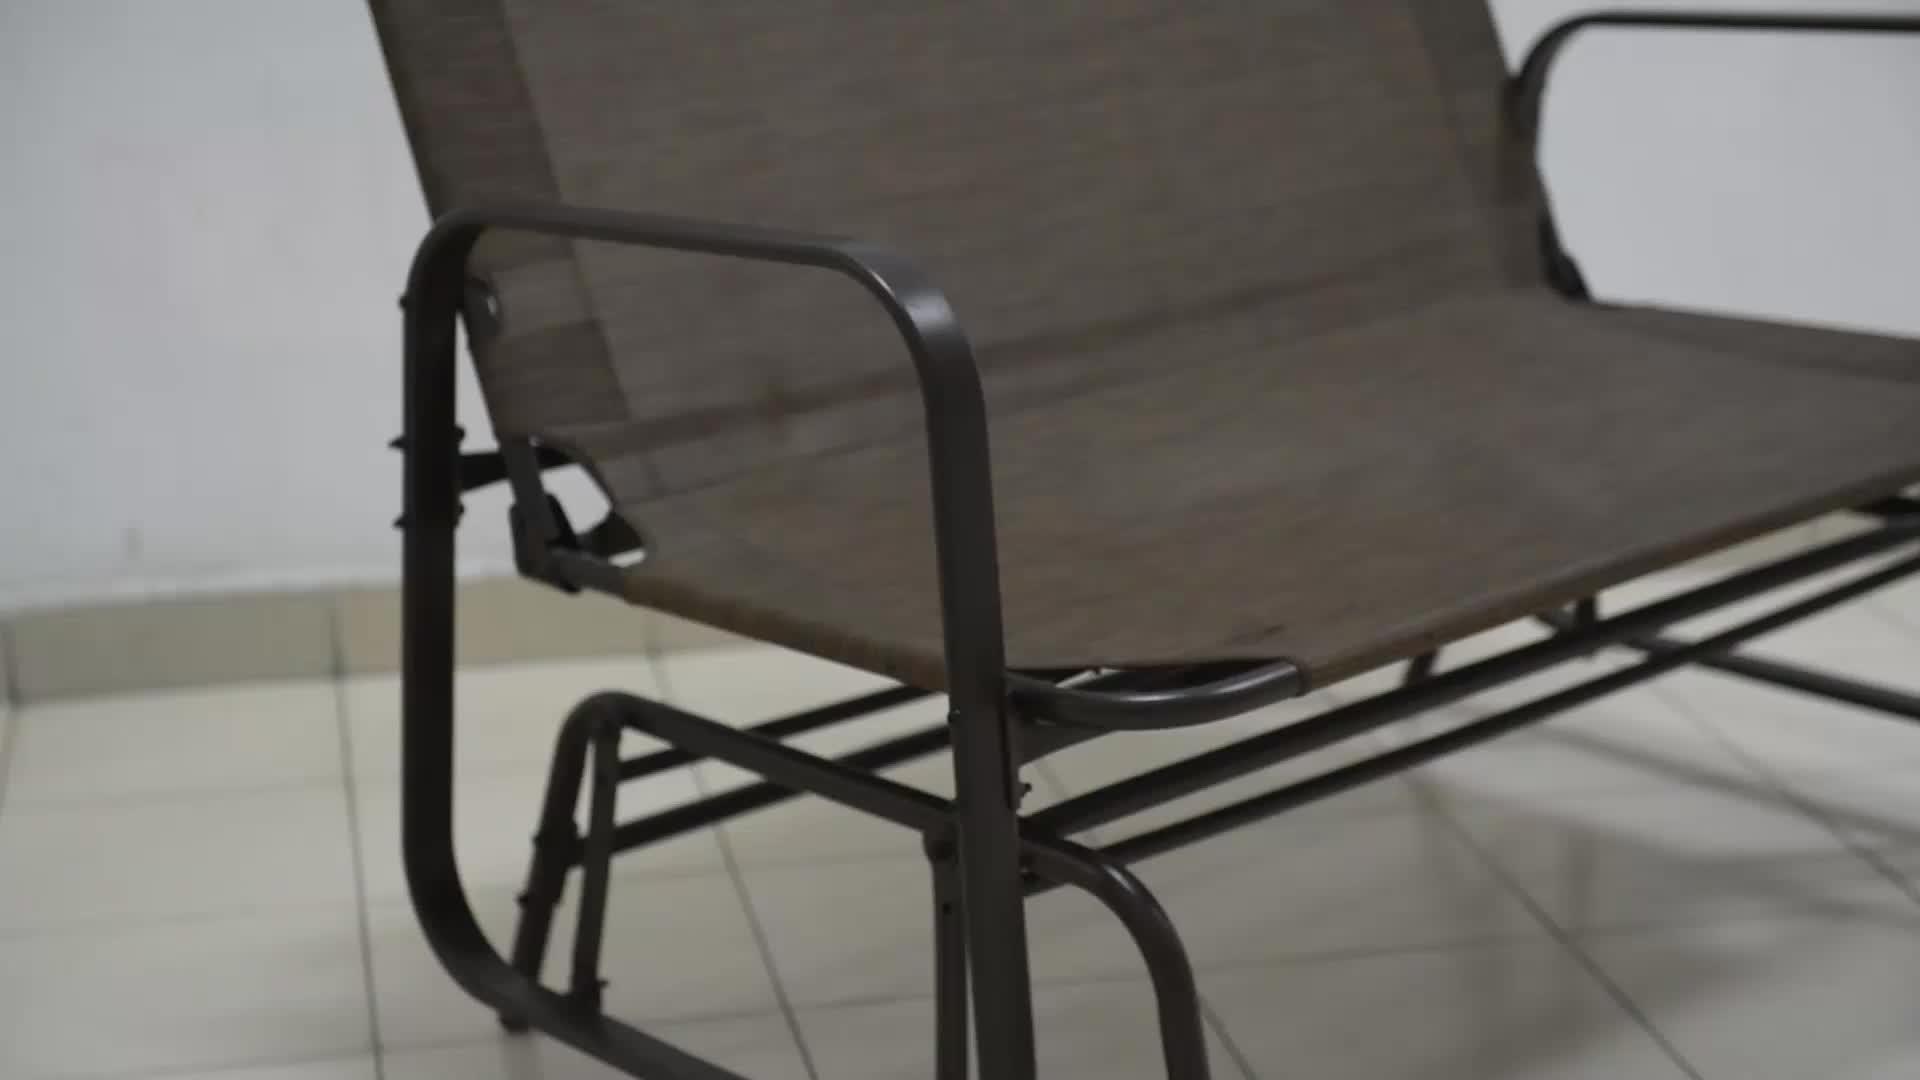 Outdoor Garden Steel Frame Patio Swing Glider Loveseat Bench Rocking Chair – Buy Outdoor Garden Bench,metal Garden Bench,glider Rocking Chair Product Intended For Outdoor Patio Swing Glider Benches (View 20 of 25)